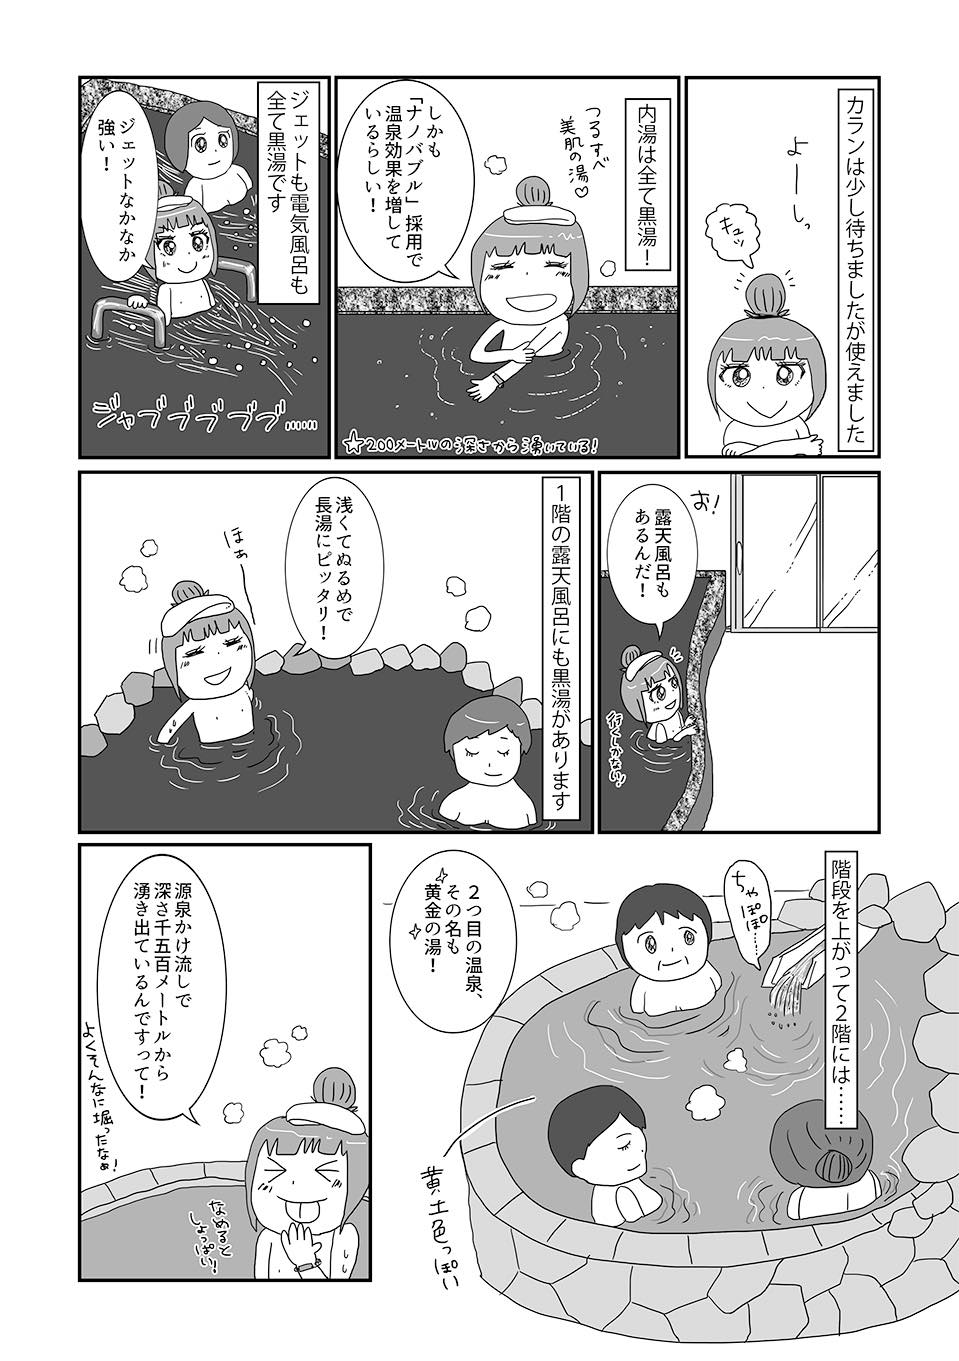 th武蔵小山温泉清水湯03